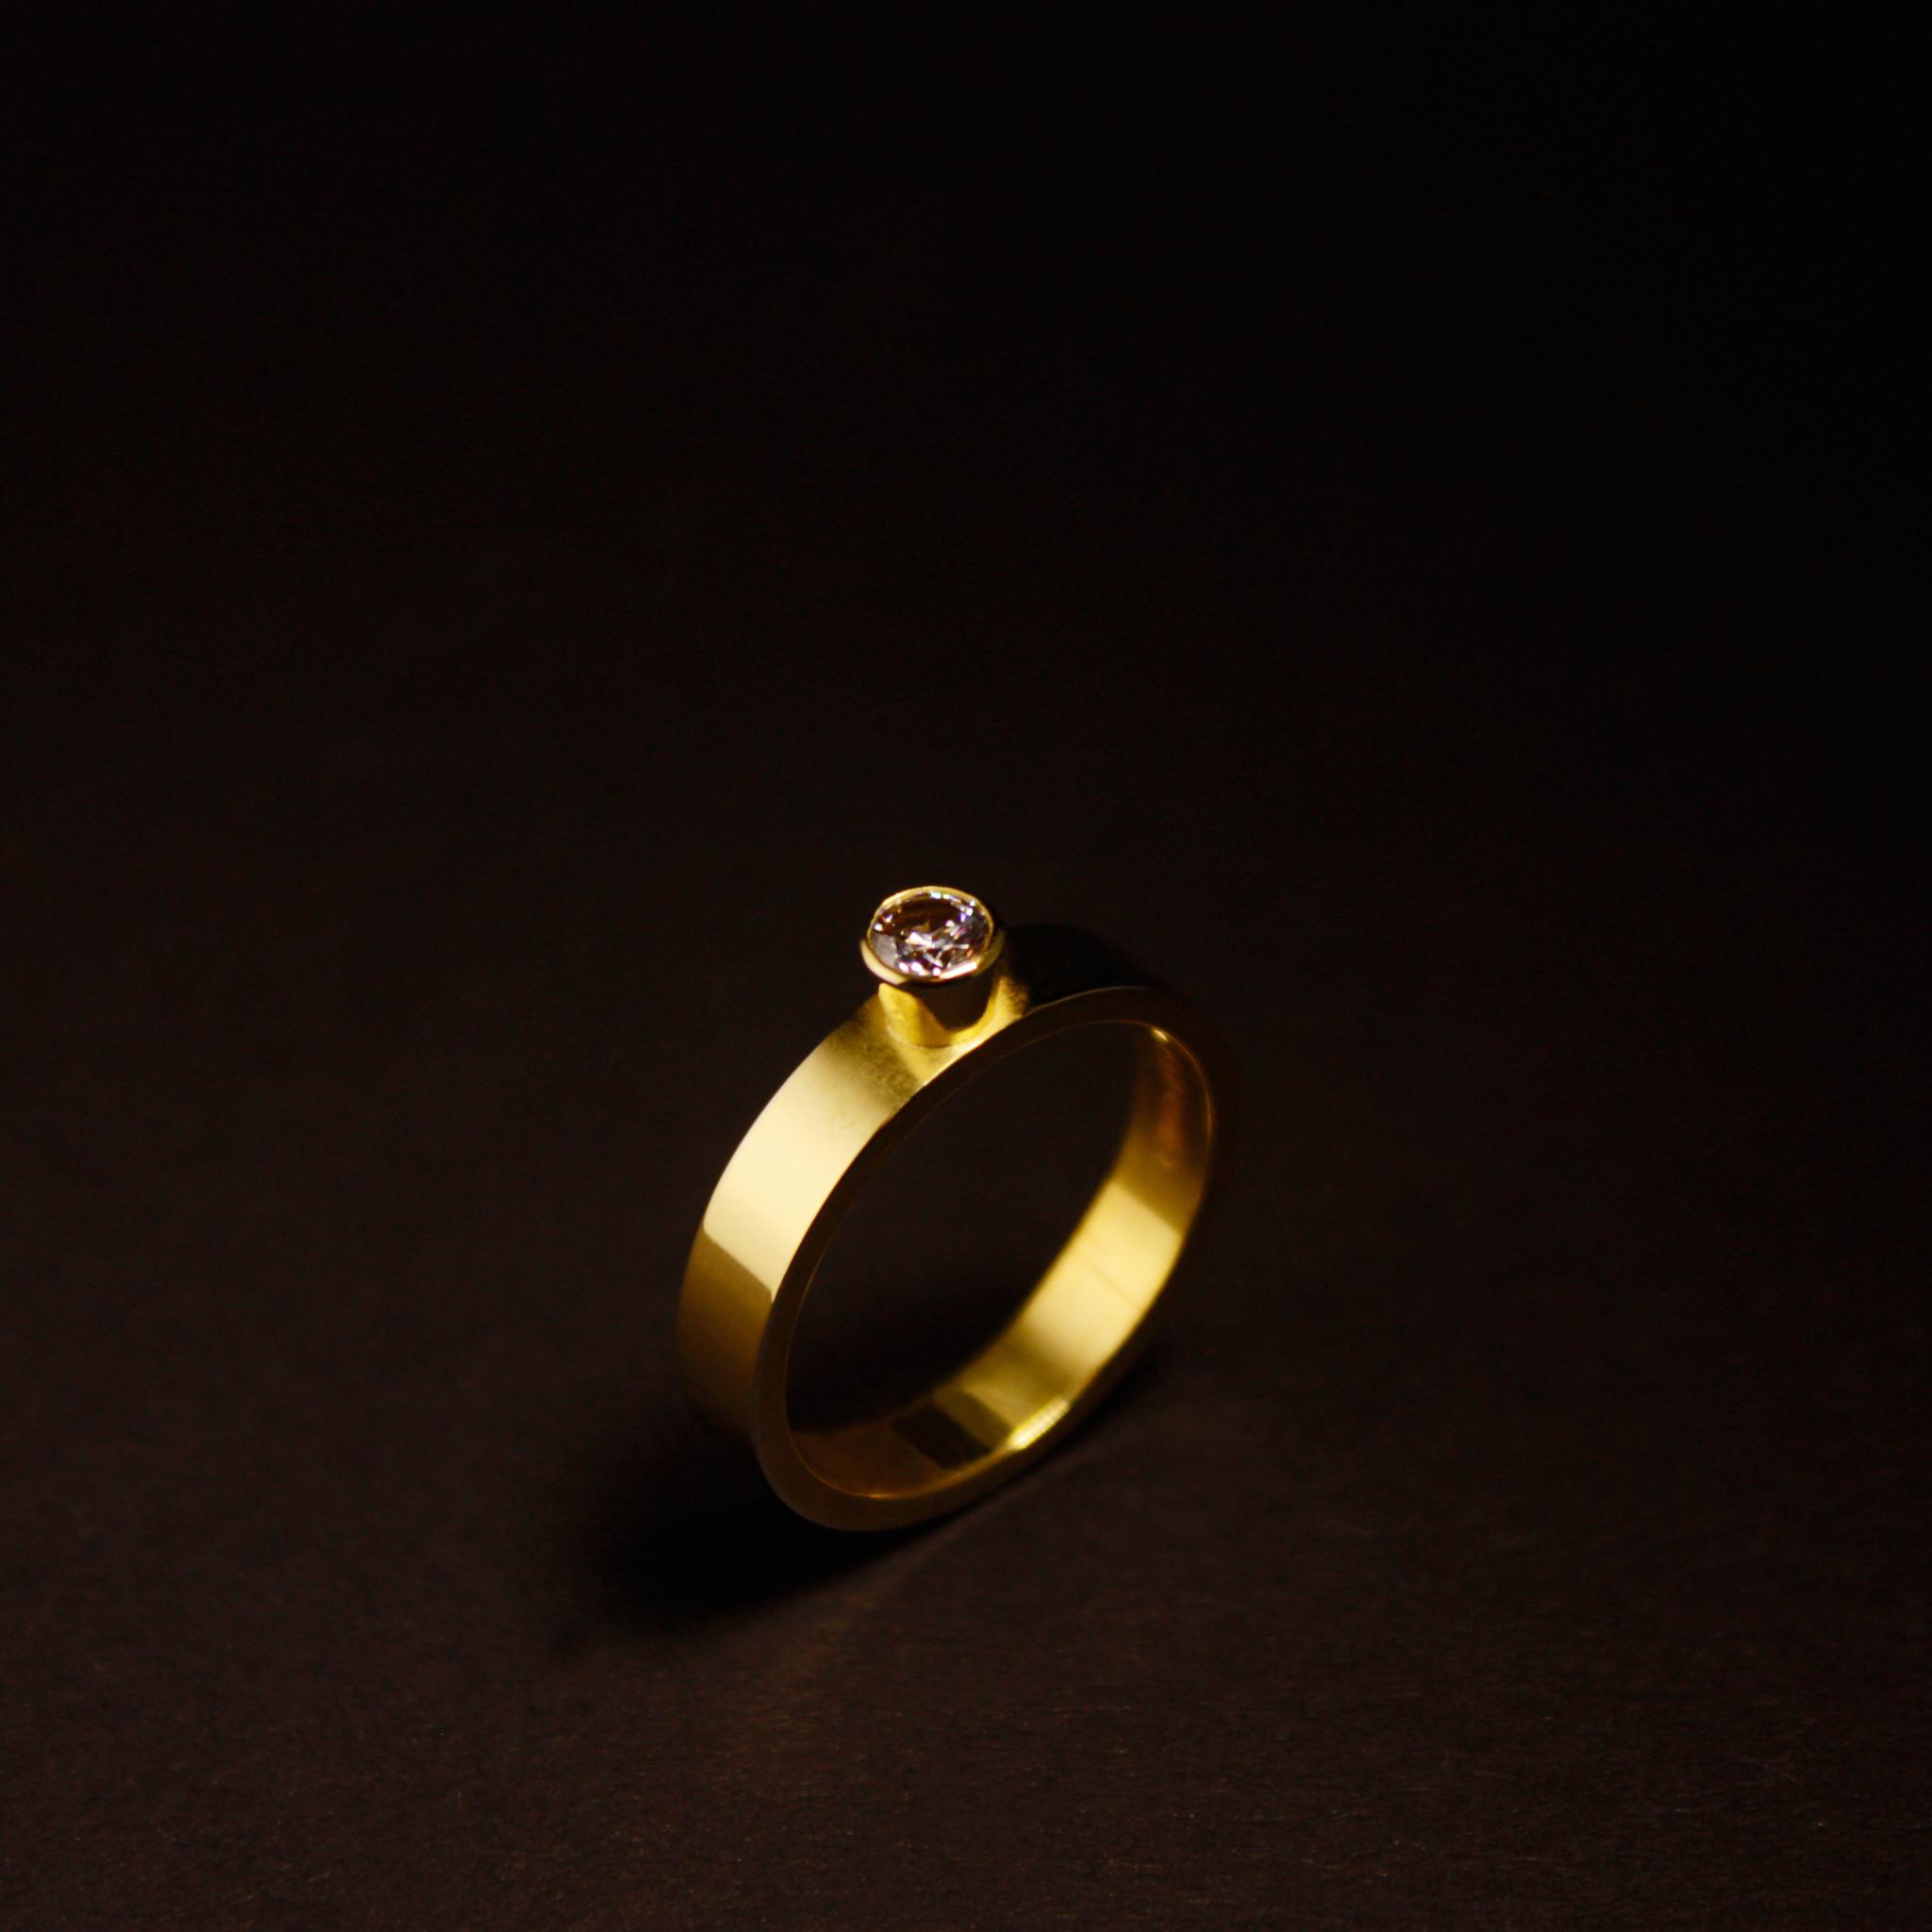 Ring WARE LIEFDE, goud-4